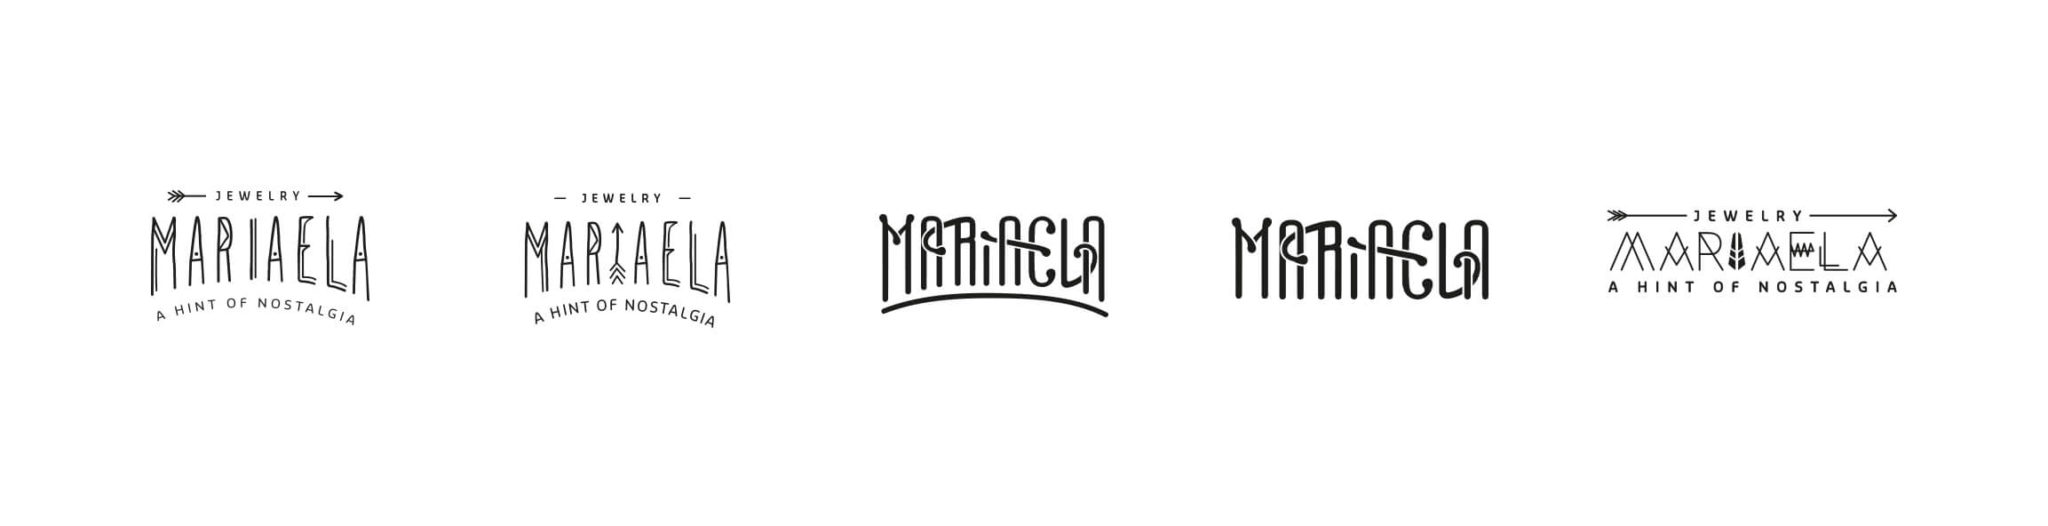 Mariaela-logo-proposals-boho-jewelry-1